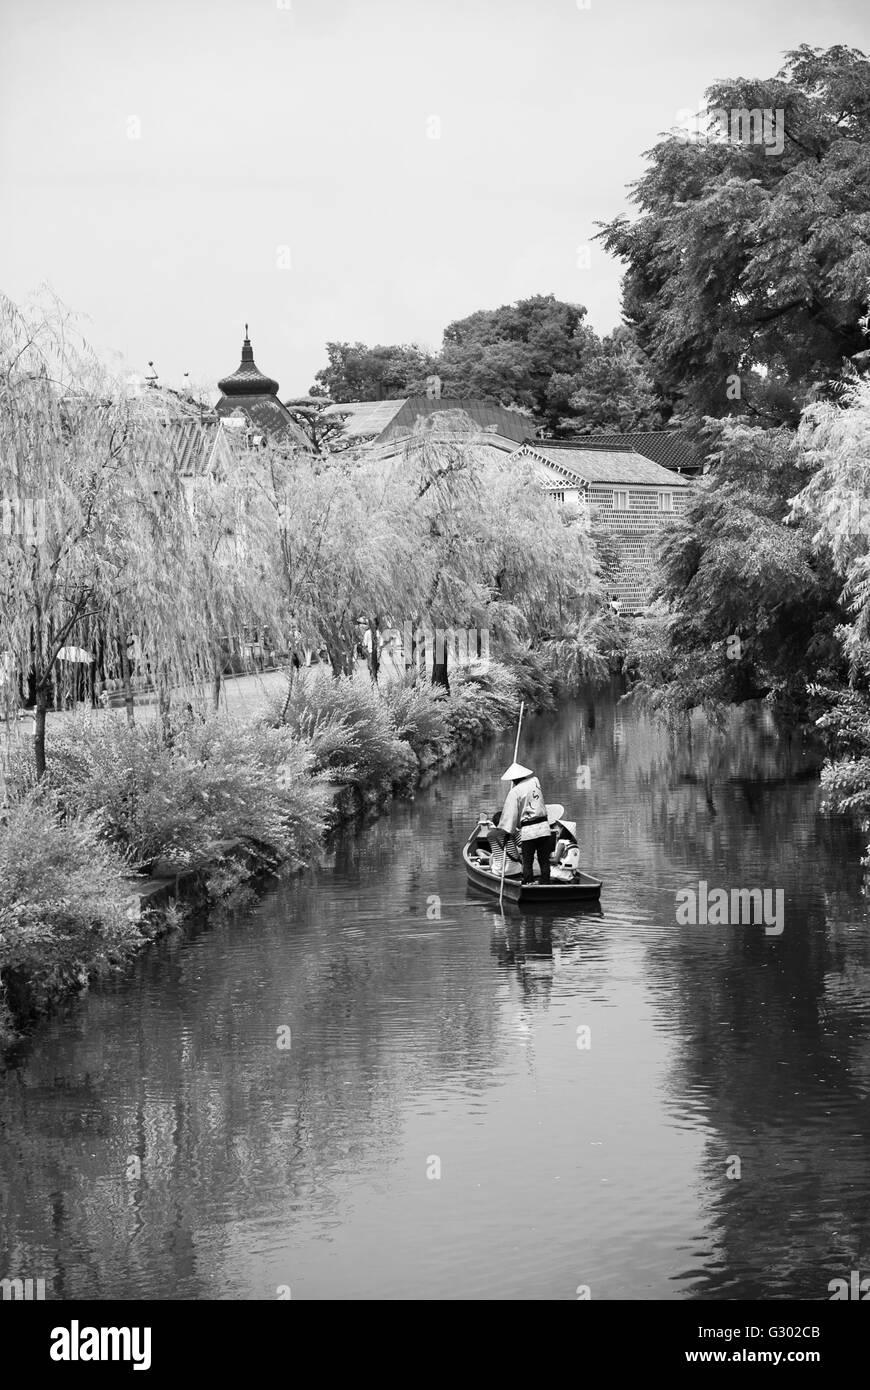 6e32f1960387 Tourists on Traditional boat in Kurashiki (Okayama